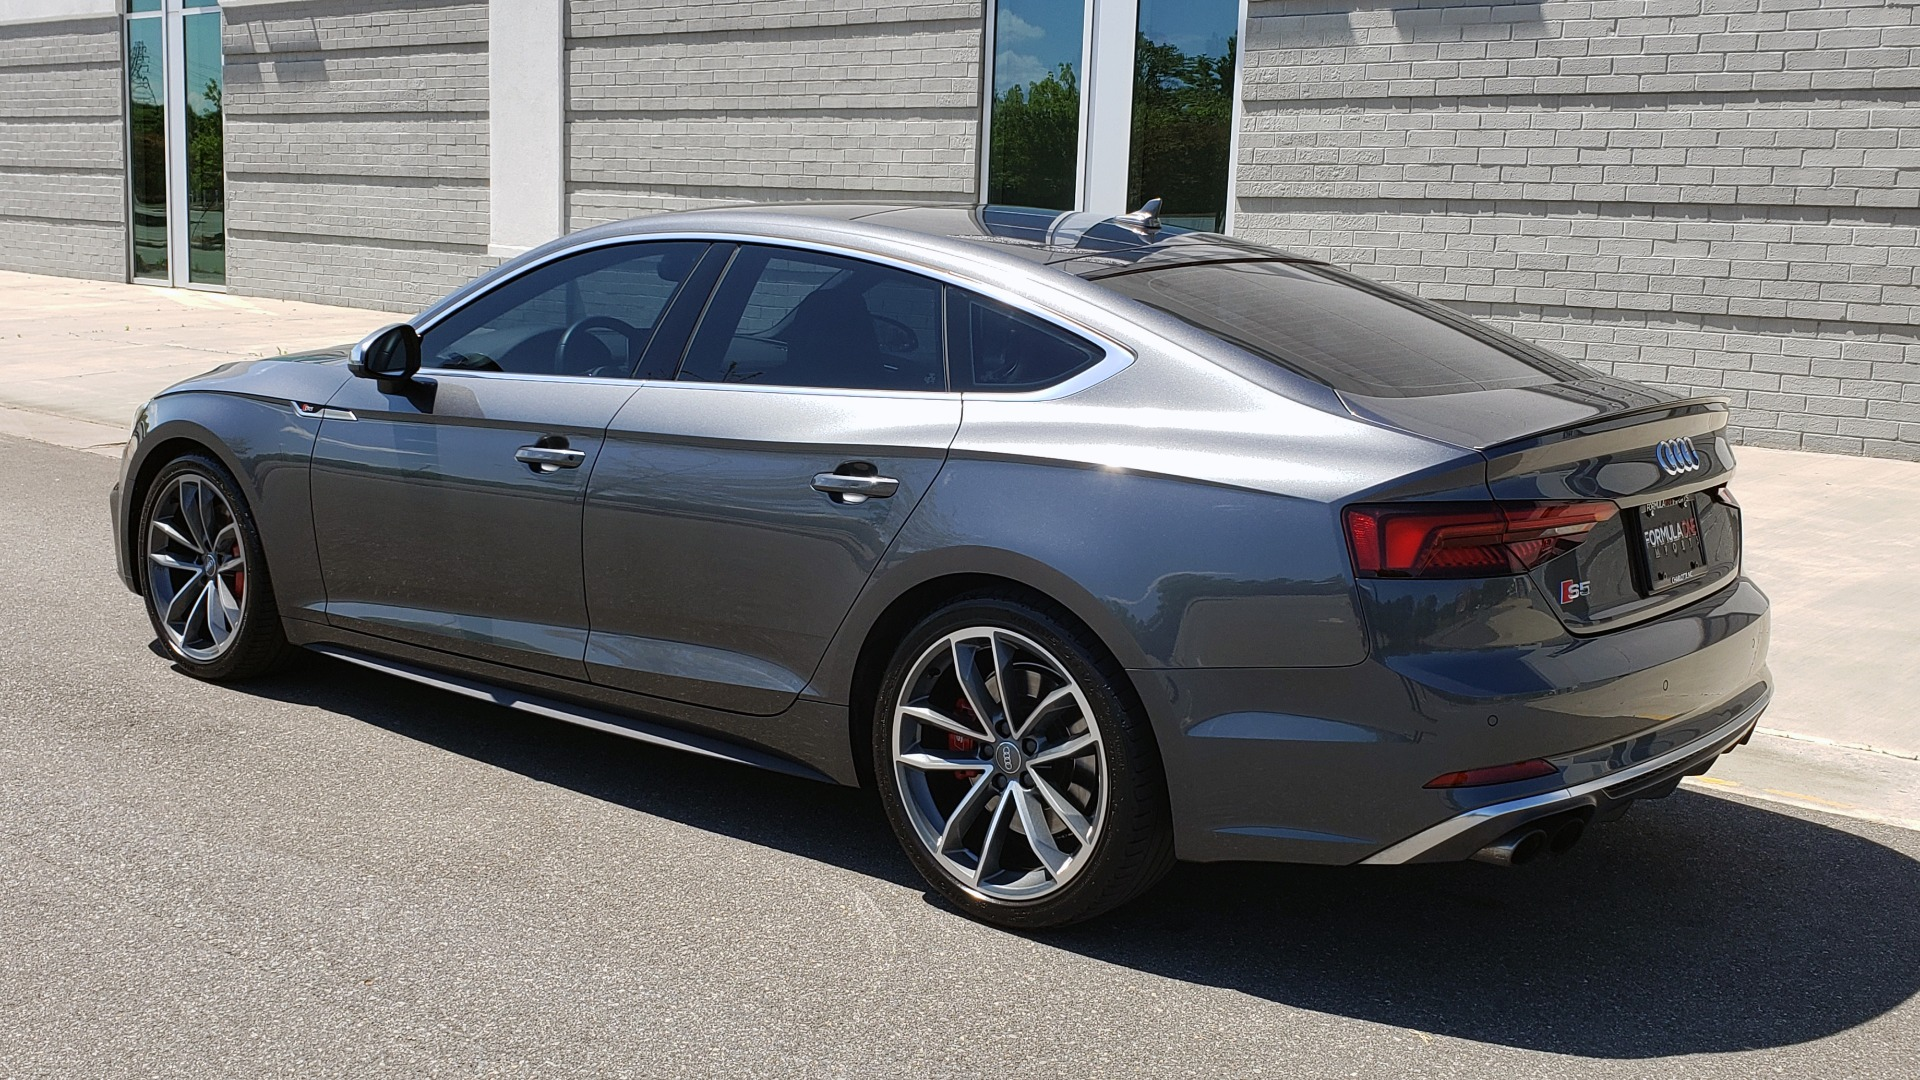 Used 2018 Audi S5 SPORTBACK PRESTIGE S-SPORT / NAV / SUNROOF / HUD / B&O SND / REARVIEW for sale $48,995 at Formula Imports in Charlotte NC 28227 5